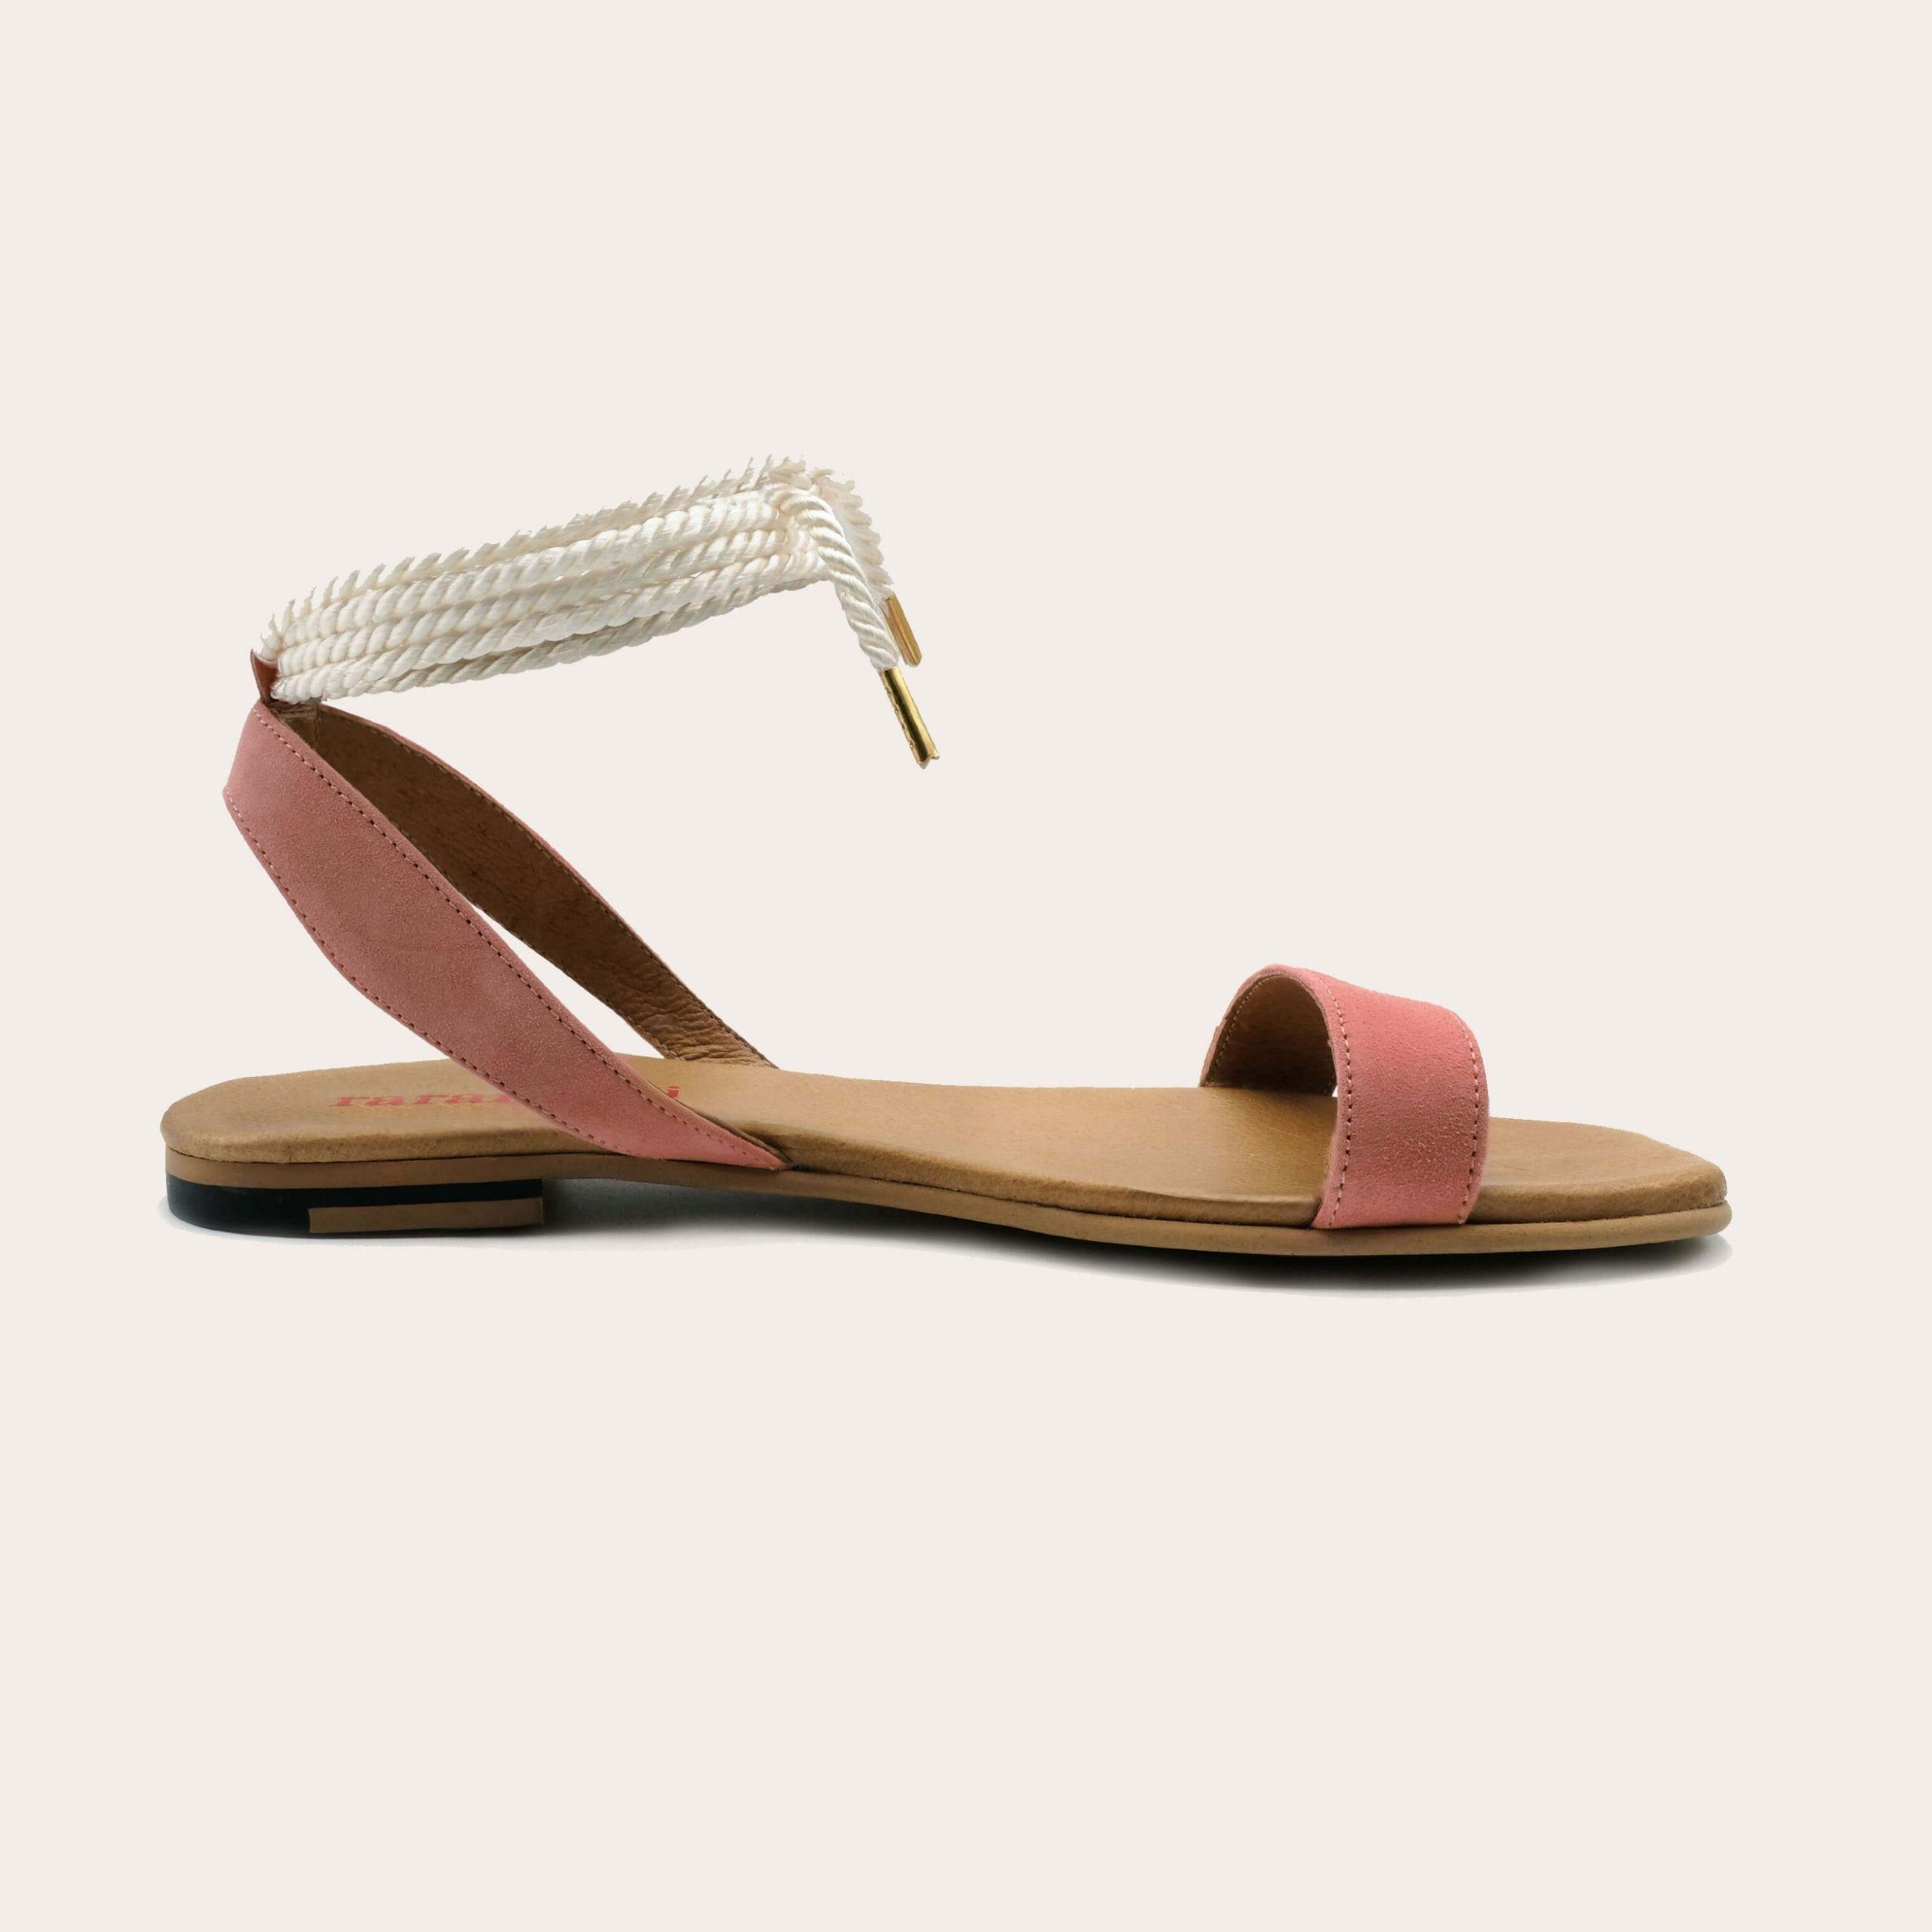 candela-apricot-lintsandalen sandals travelsandals vegan sustainable sandals wikkelsandalen